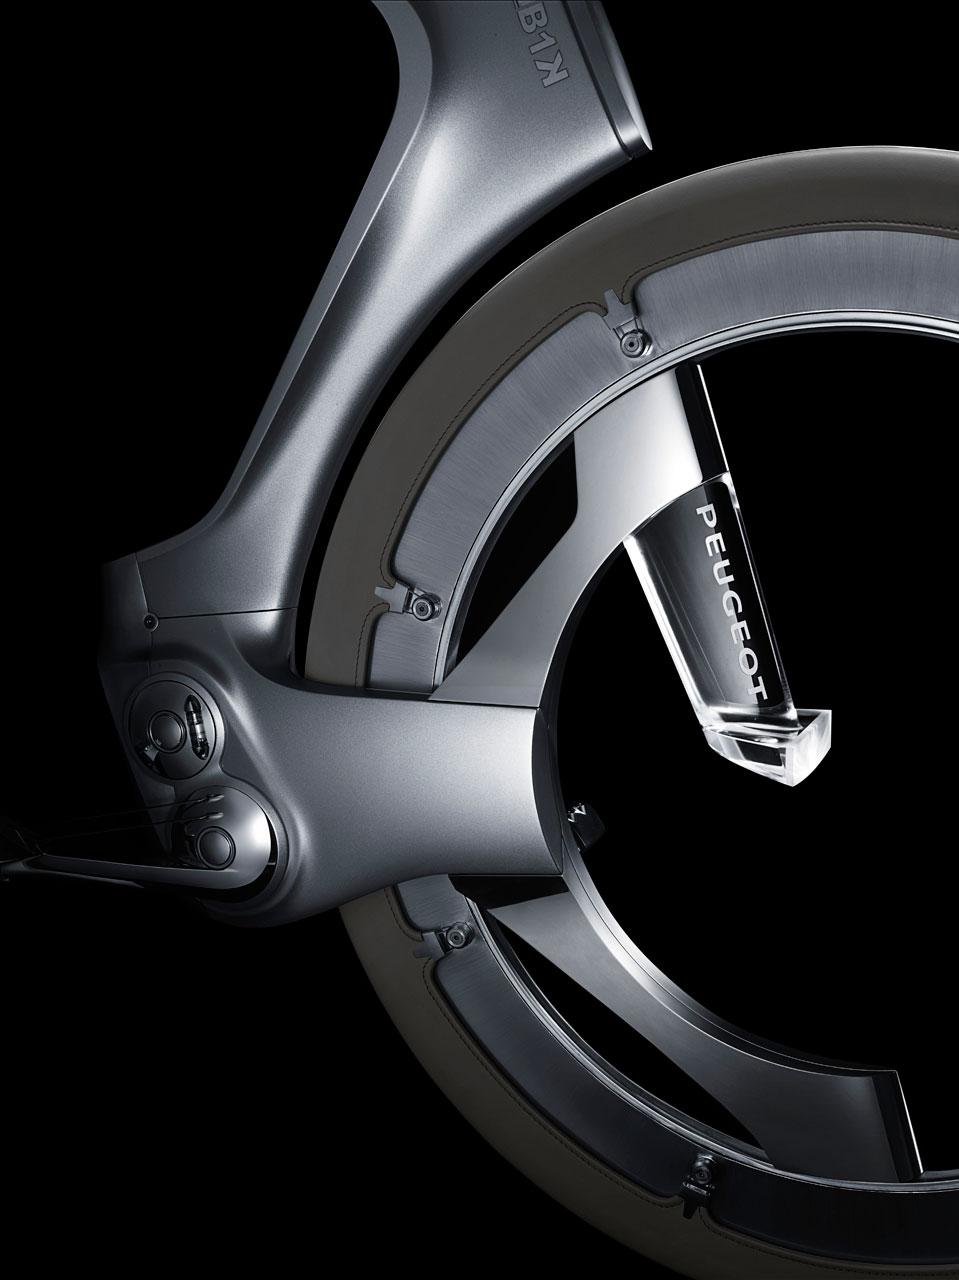 http://www.carbodydesign.com/archive/2010/02/peugeot-b1k-bike-concept/Peugeot-B1K-Bike-Concept-4-lg.jpg